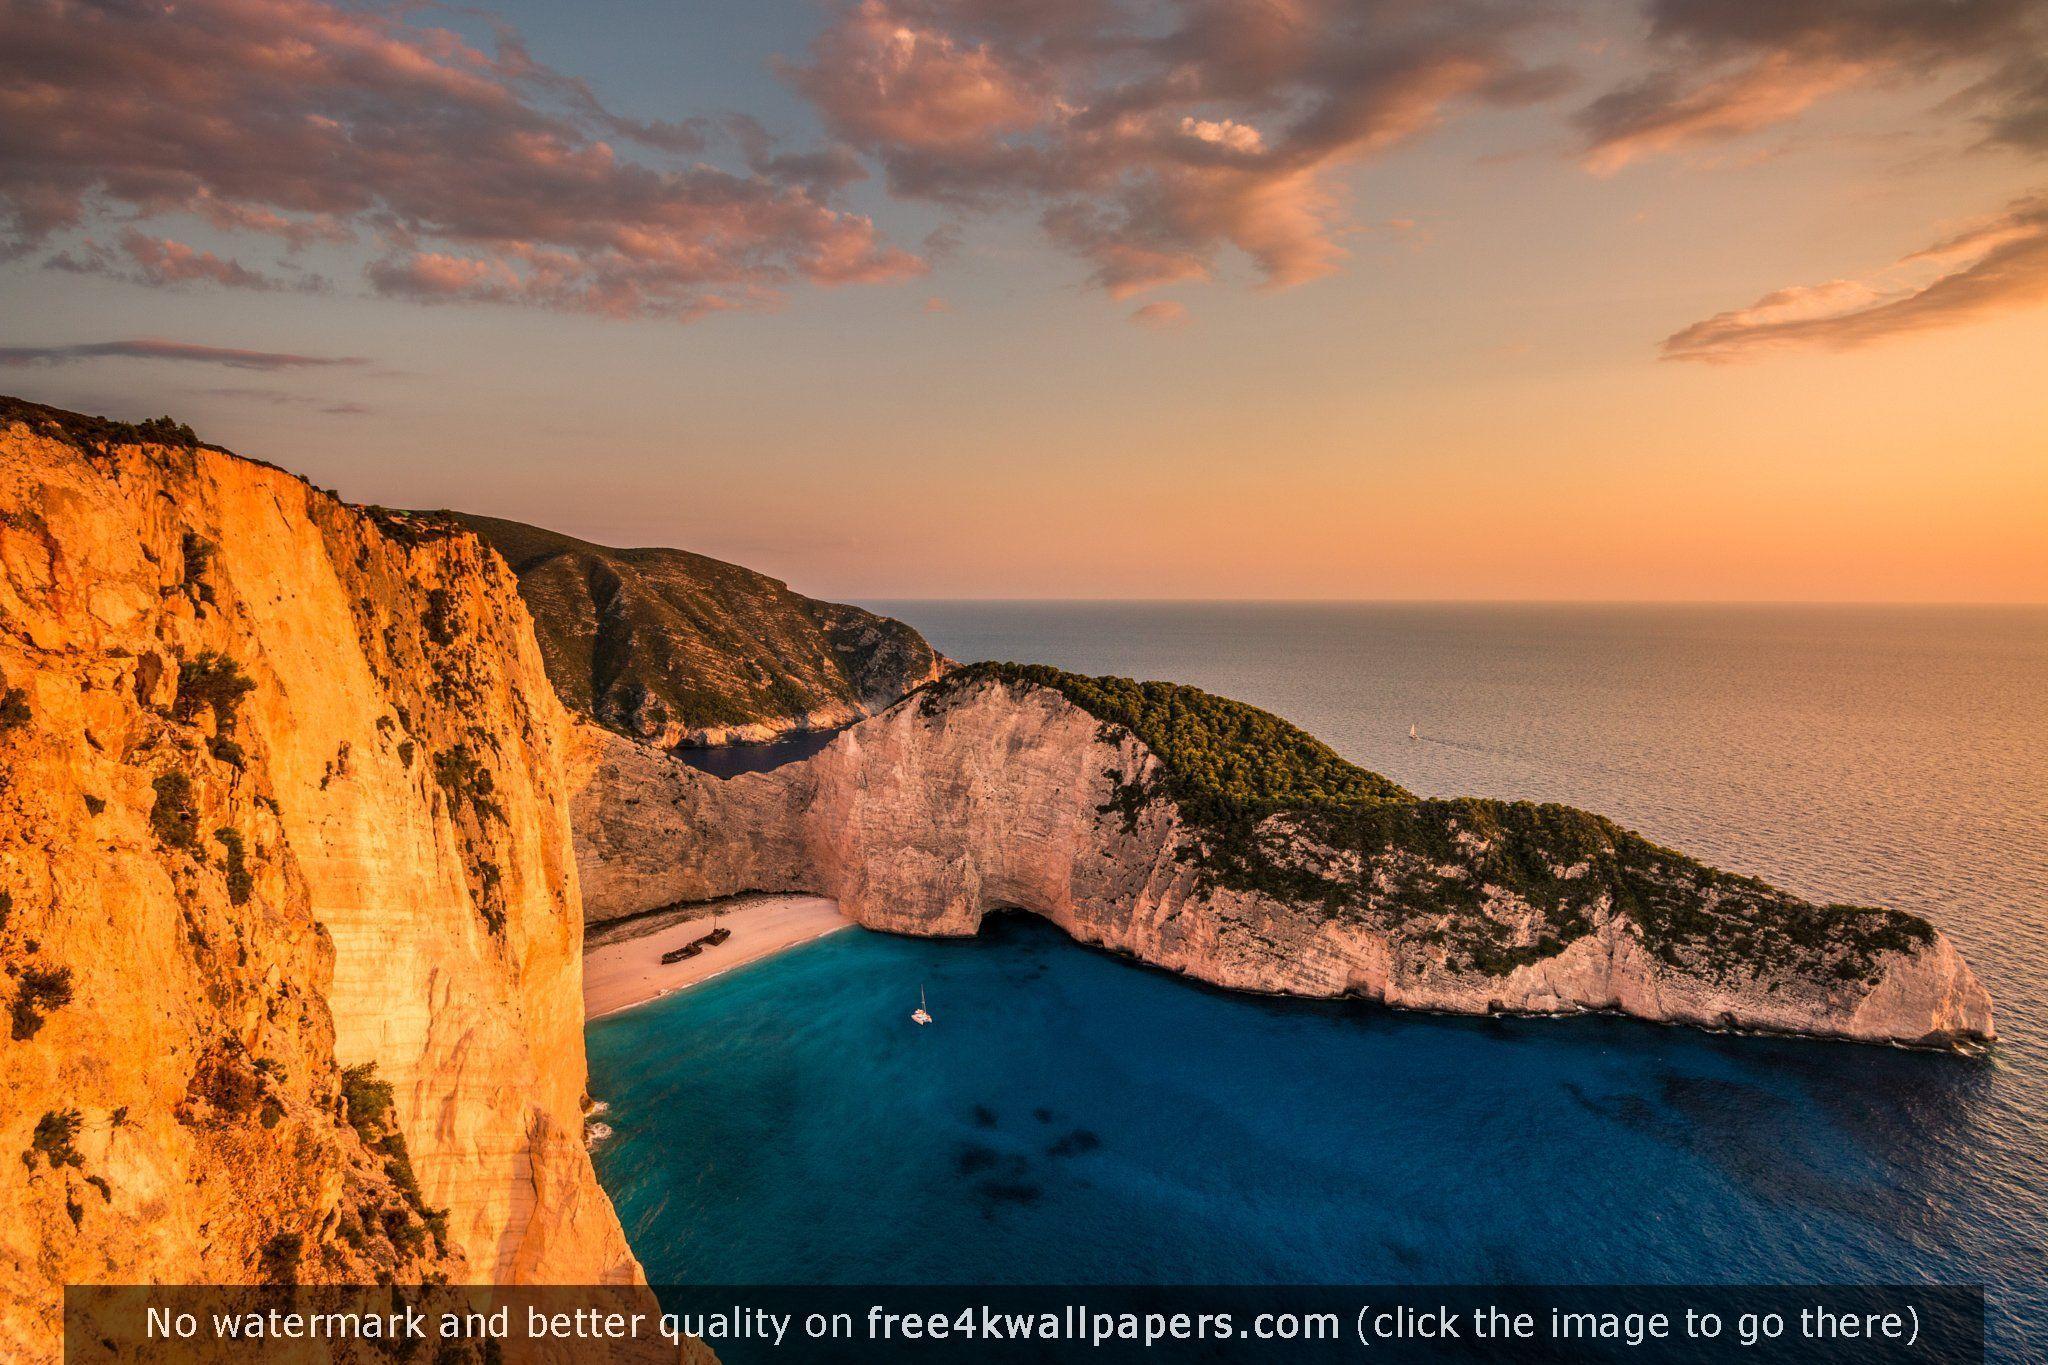 Greece Beach Wallpaper: Shipwreck Bay In Zakynthos During Sunset Navagio Beach